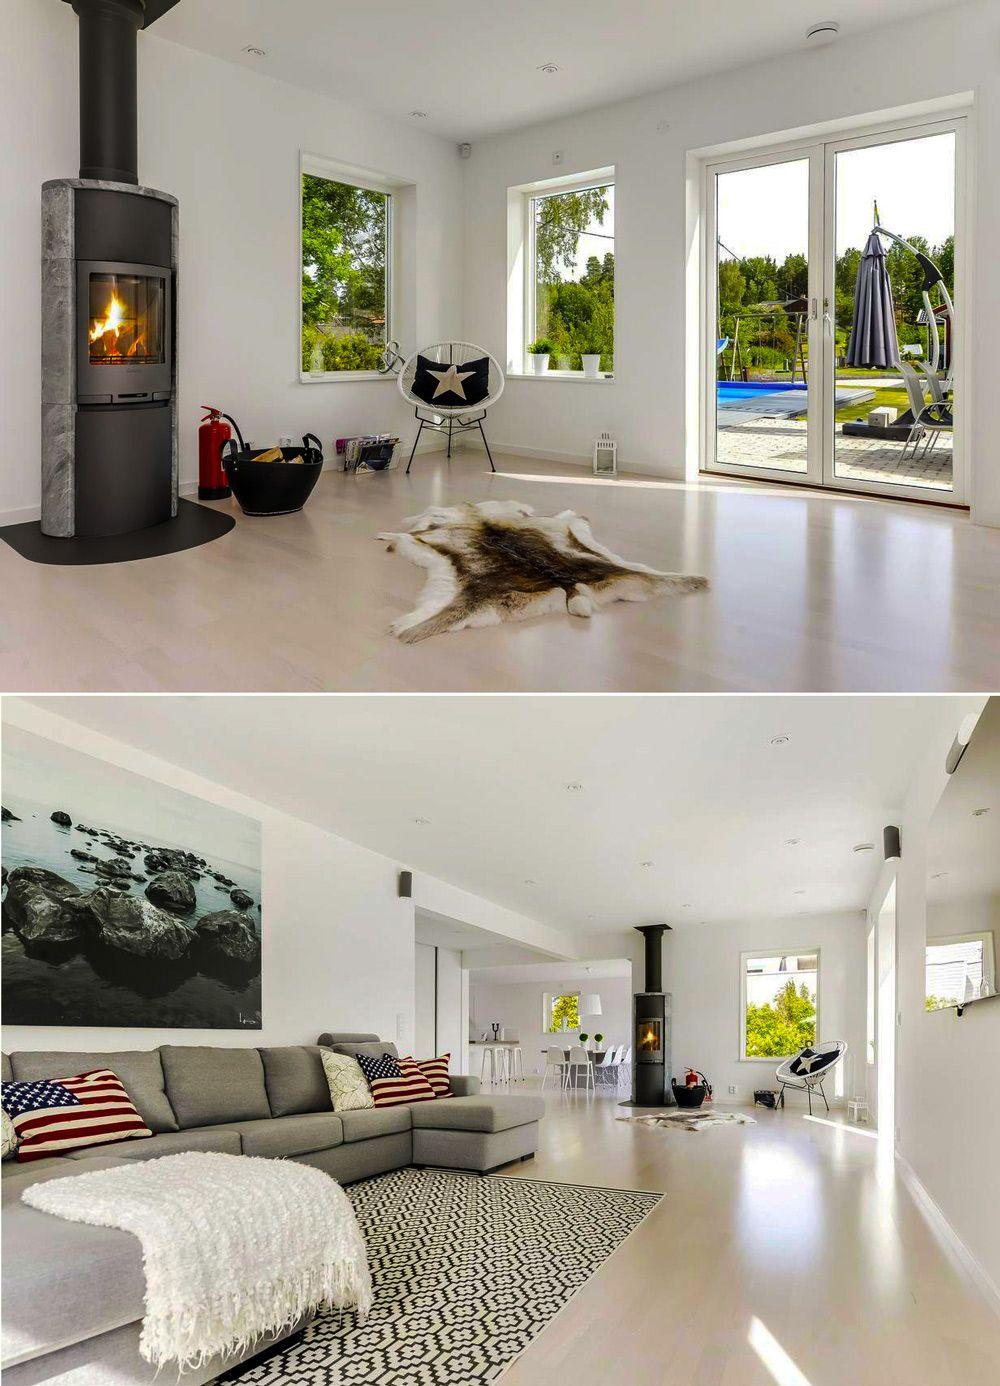 Innenarchitektur, Kamin   Haus   Pinterest   Interiors, Architecture ...